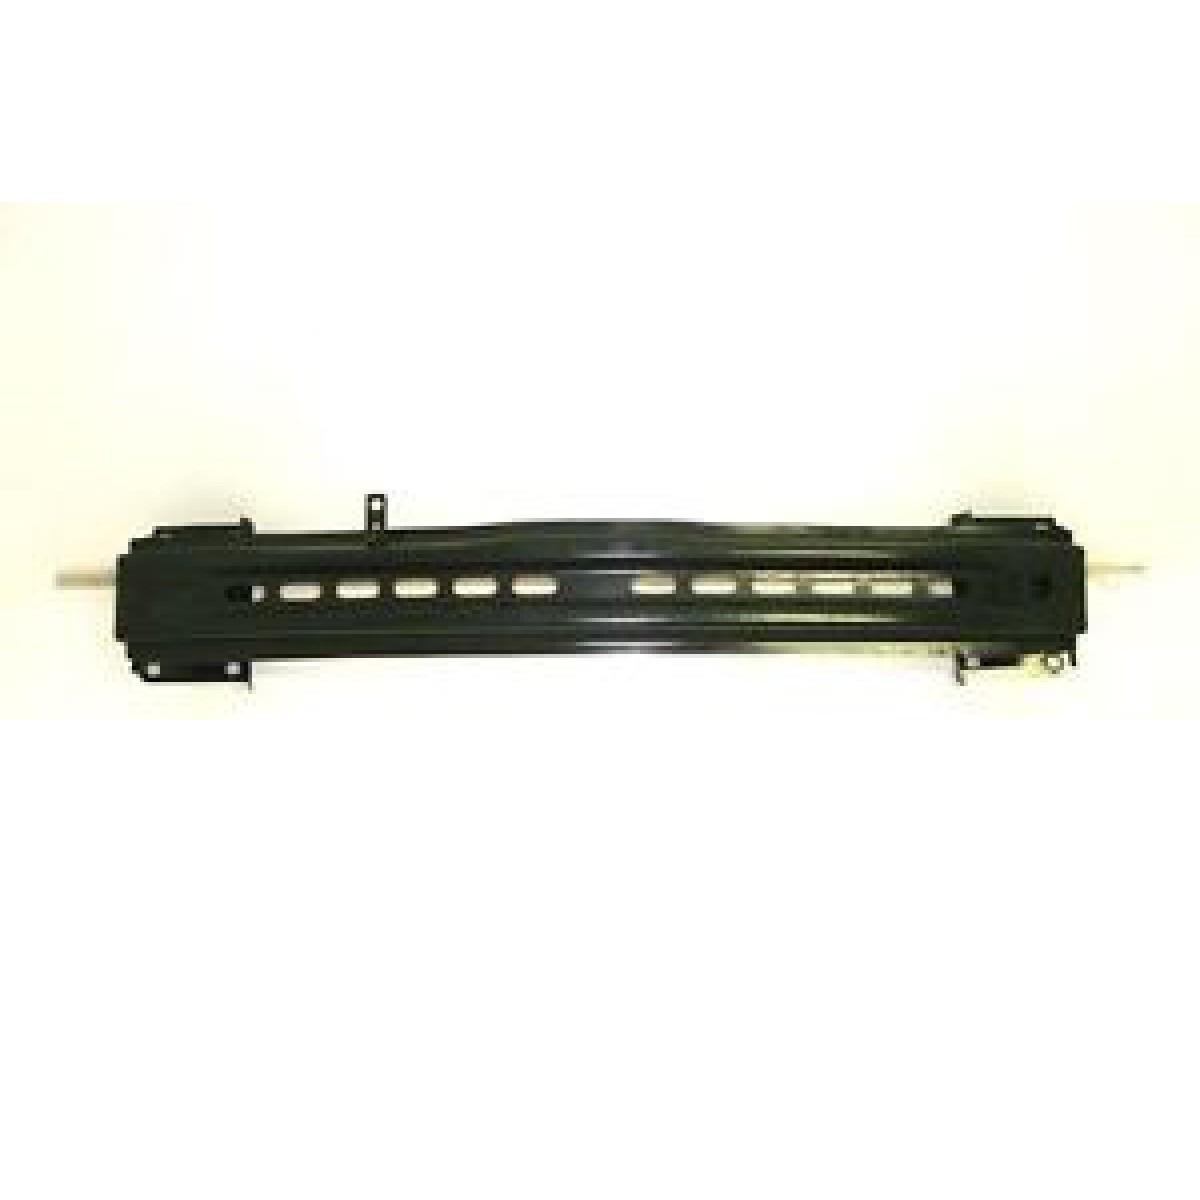 Шина бампера передні Skoda Octavia A7 13- (FPS) 5E0807109A